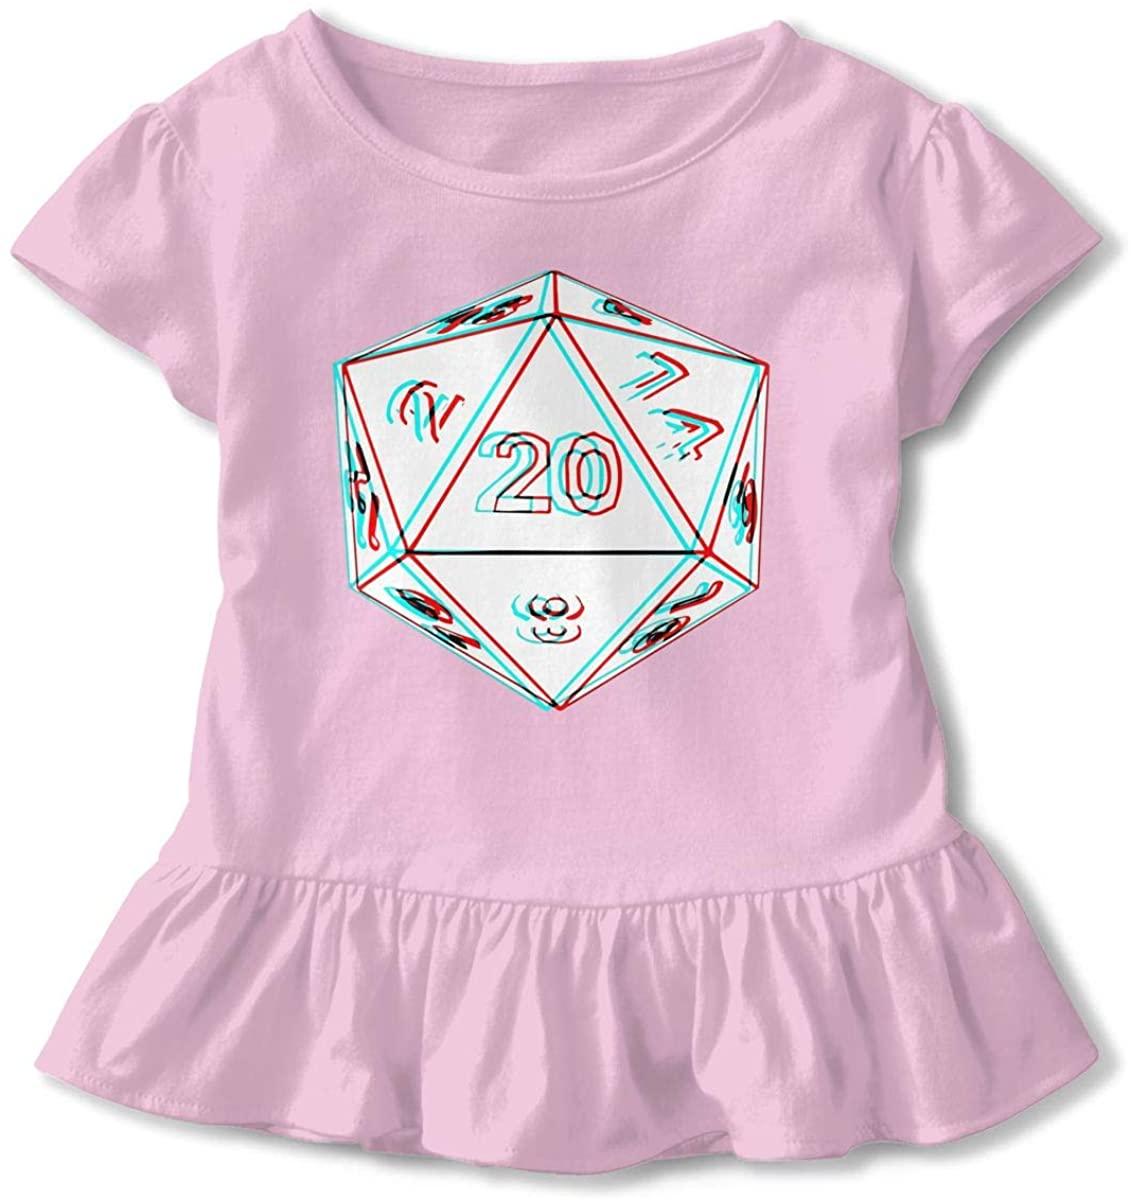 EASON-G Toddler Girl's Ruffle T-Shirt 3D 20 Dice Short Sleeve 2-6T